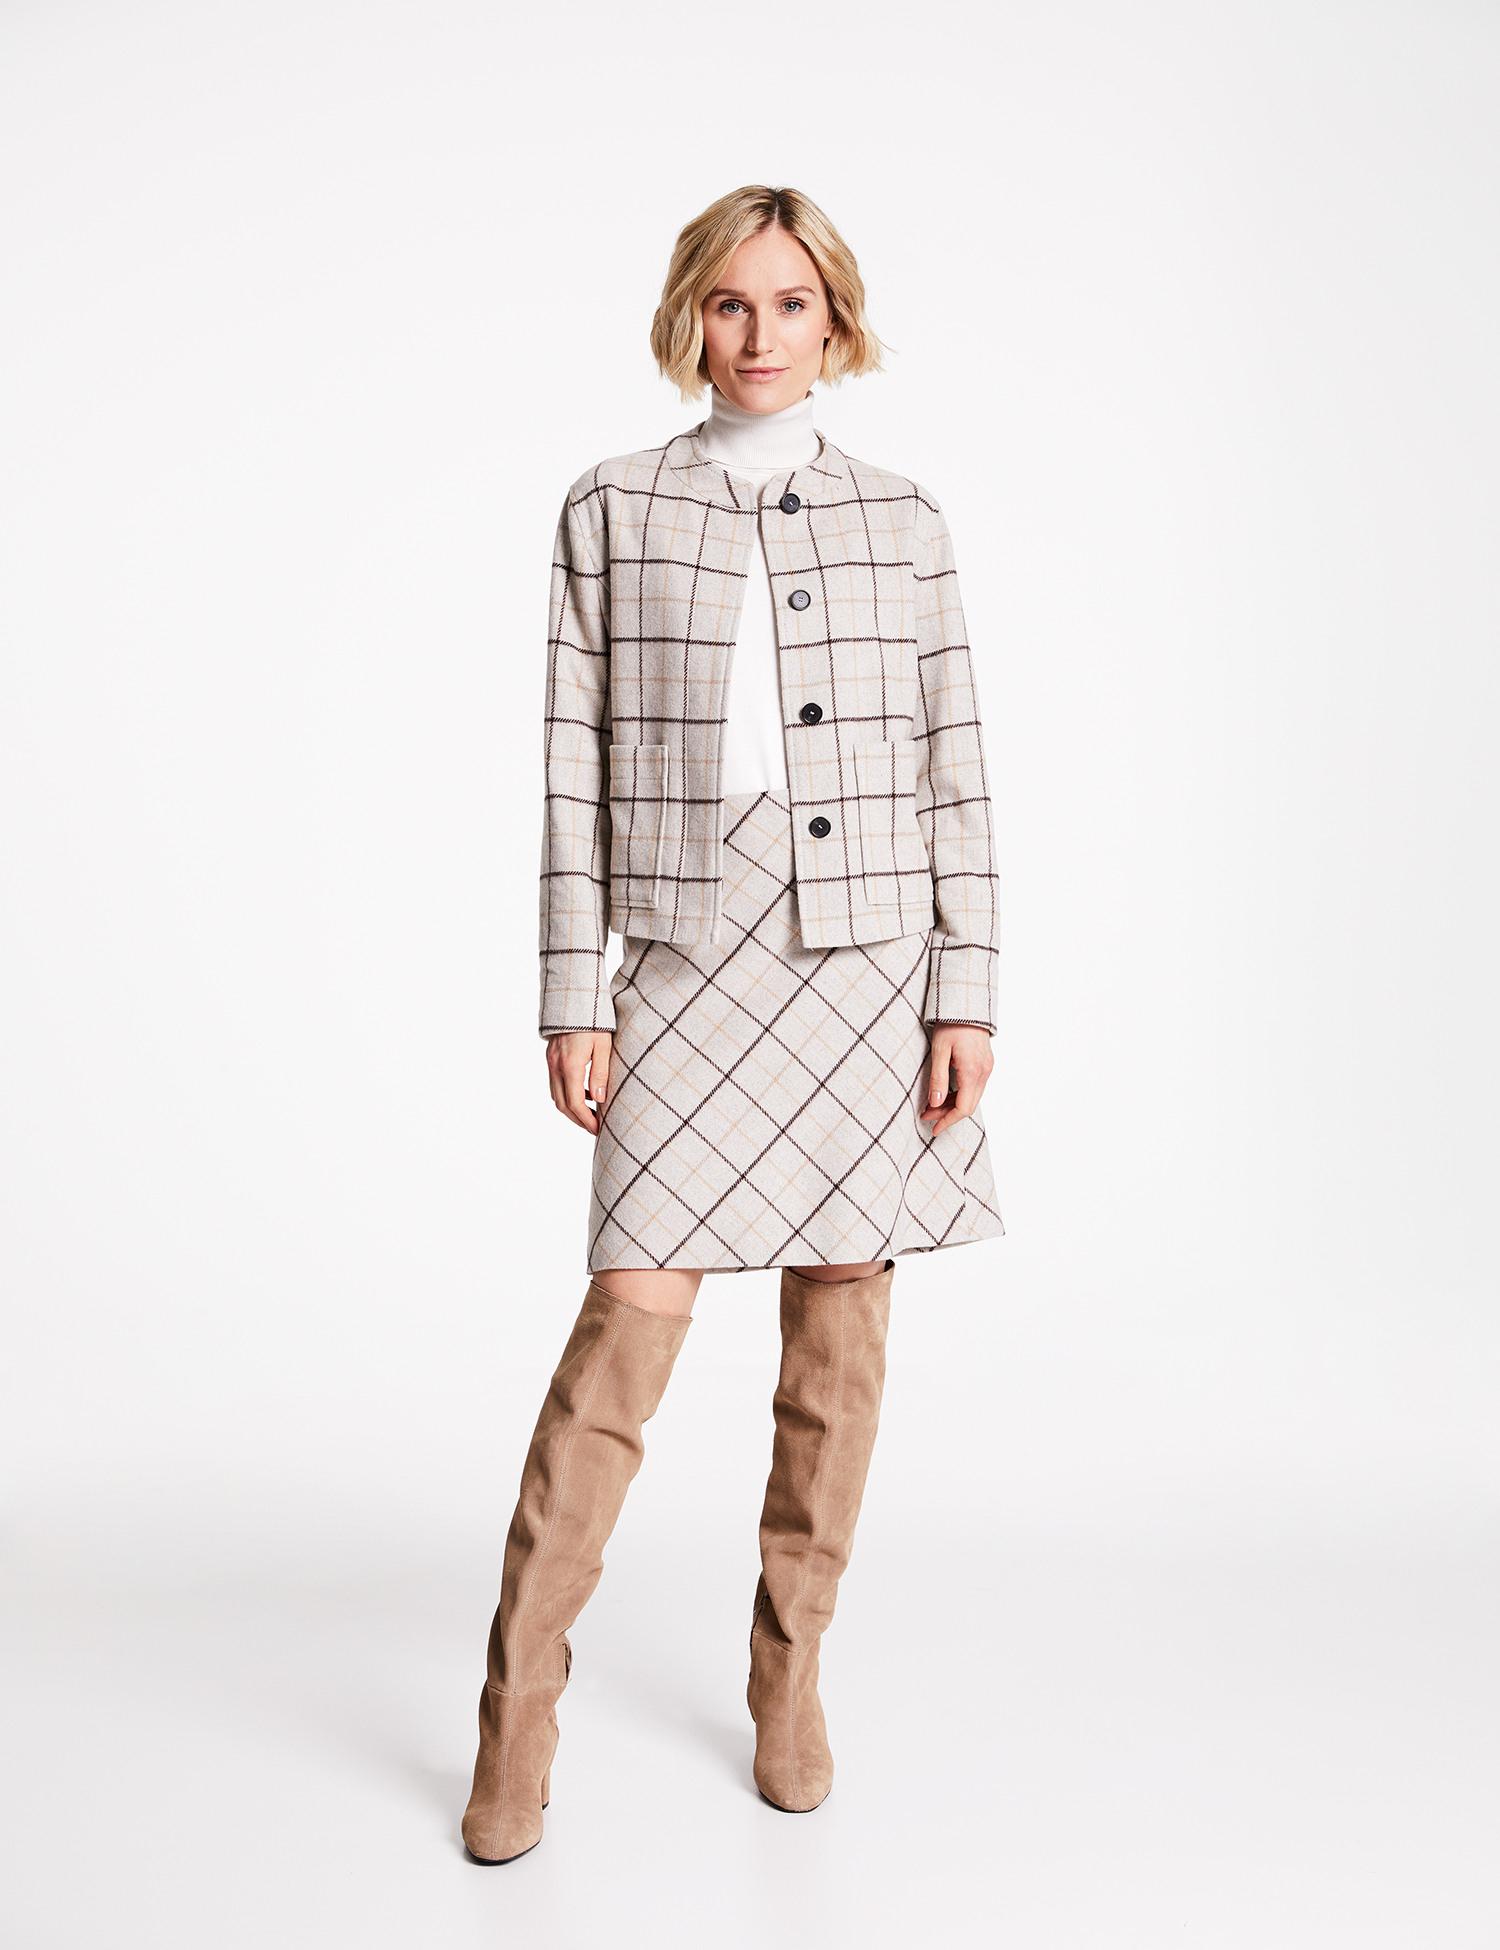 Modetrends Im Herbst 2020/21  Midlifeblog